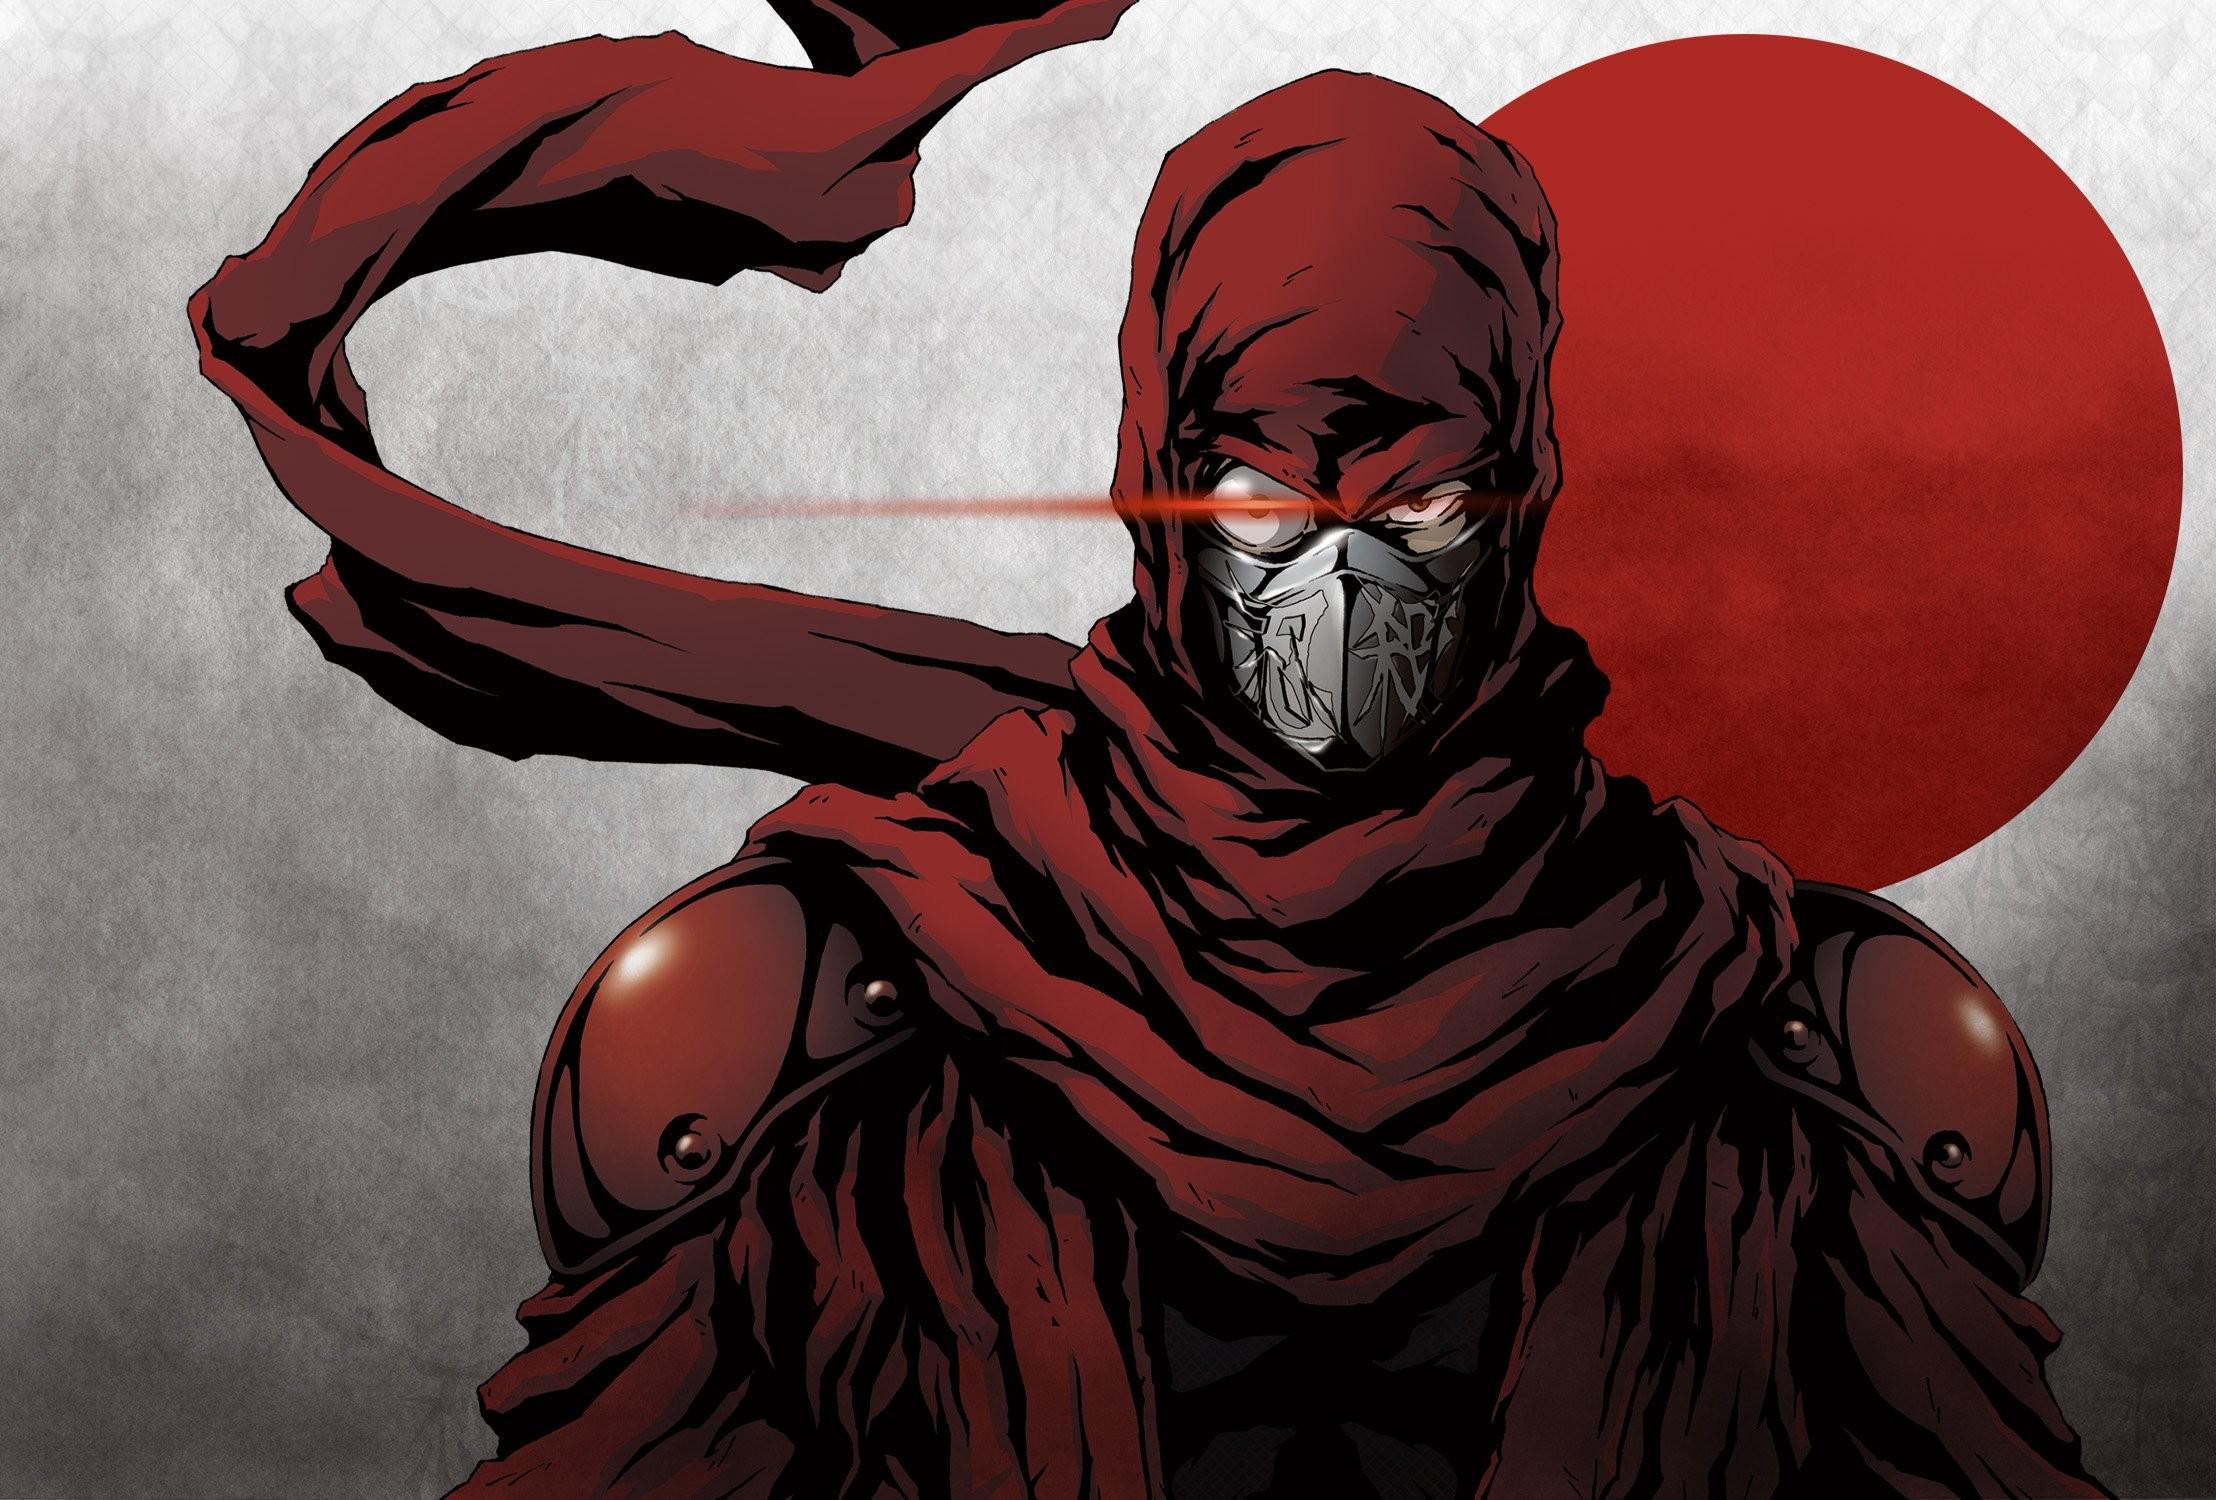 Res: 2216x1500, NINJA SLAYER Ninjasureiya sci-fi cyberpunk fighting animation anime  1nslayer warrior wallpaper |  |